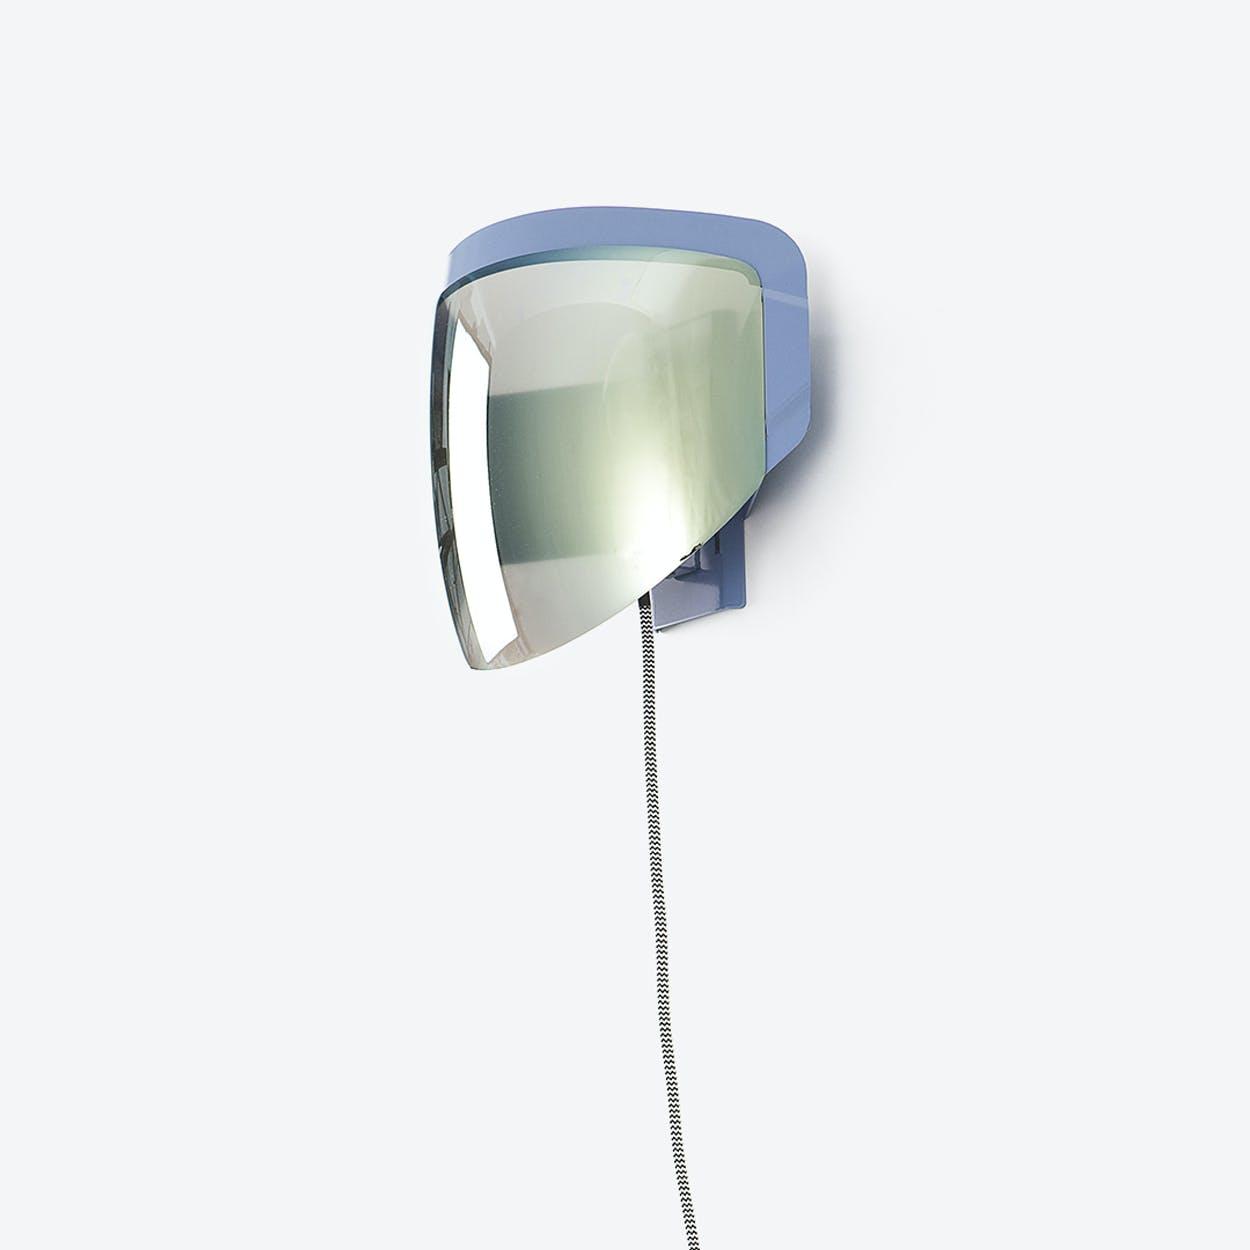 Moto - Wall Lamp with Plug - Optical Grey